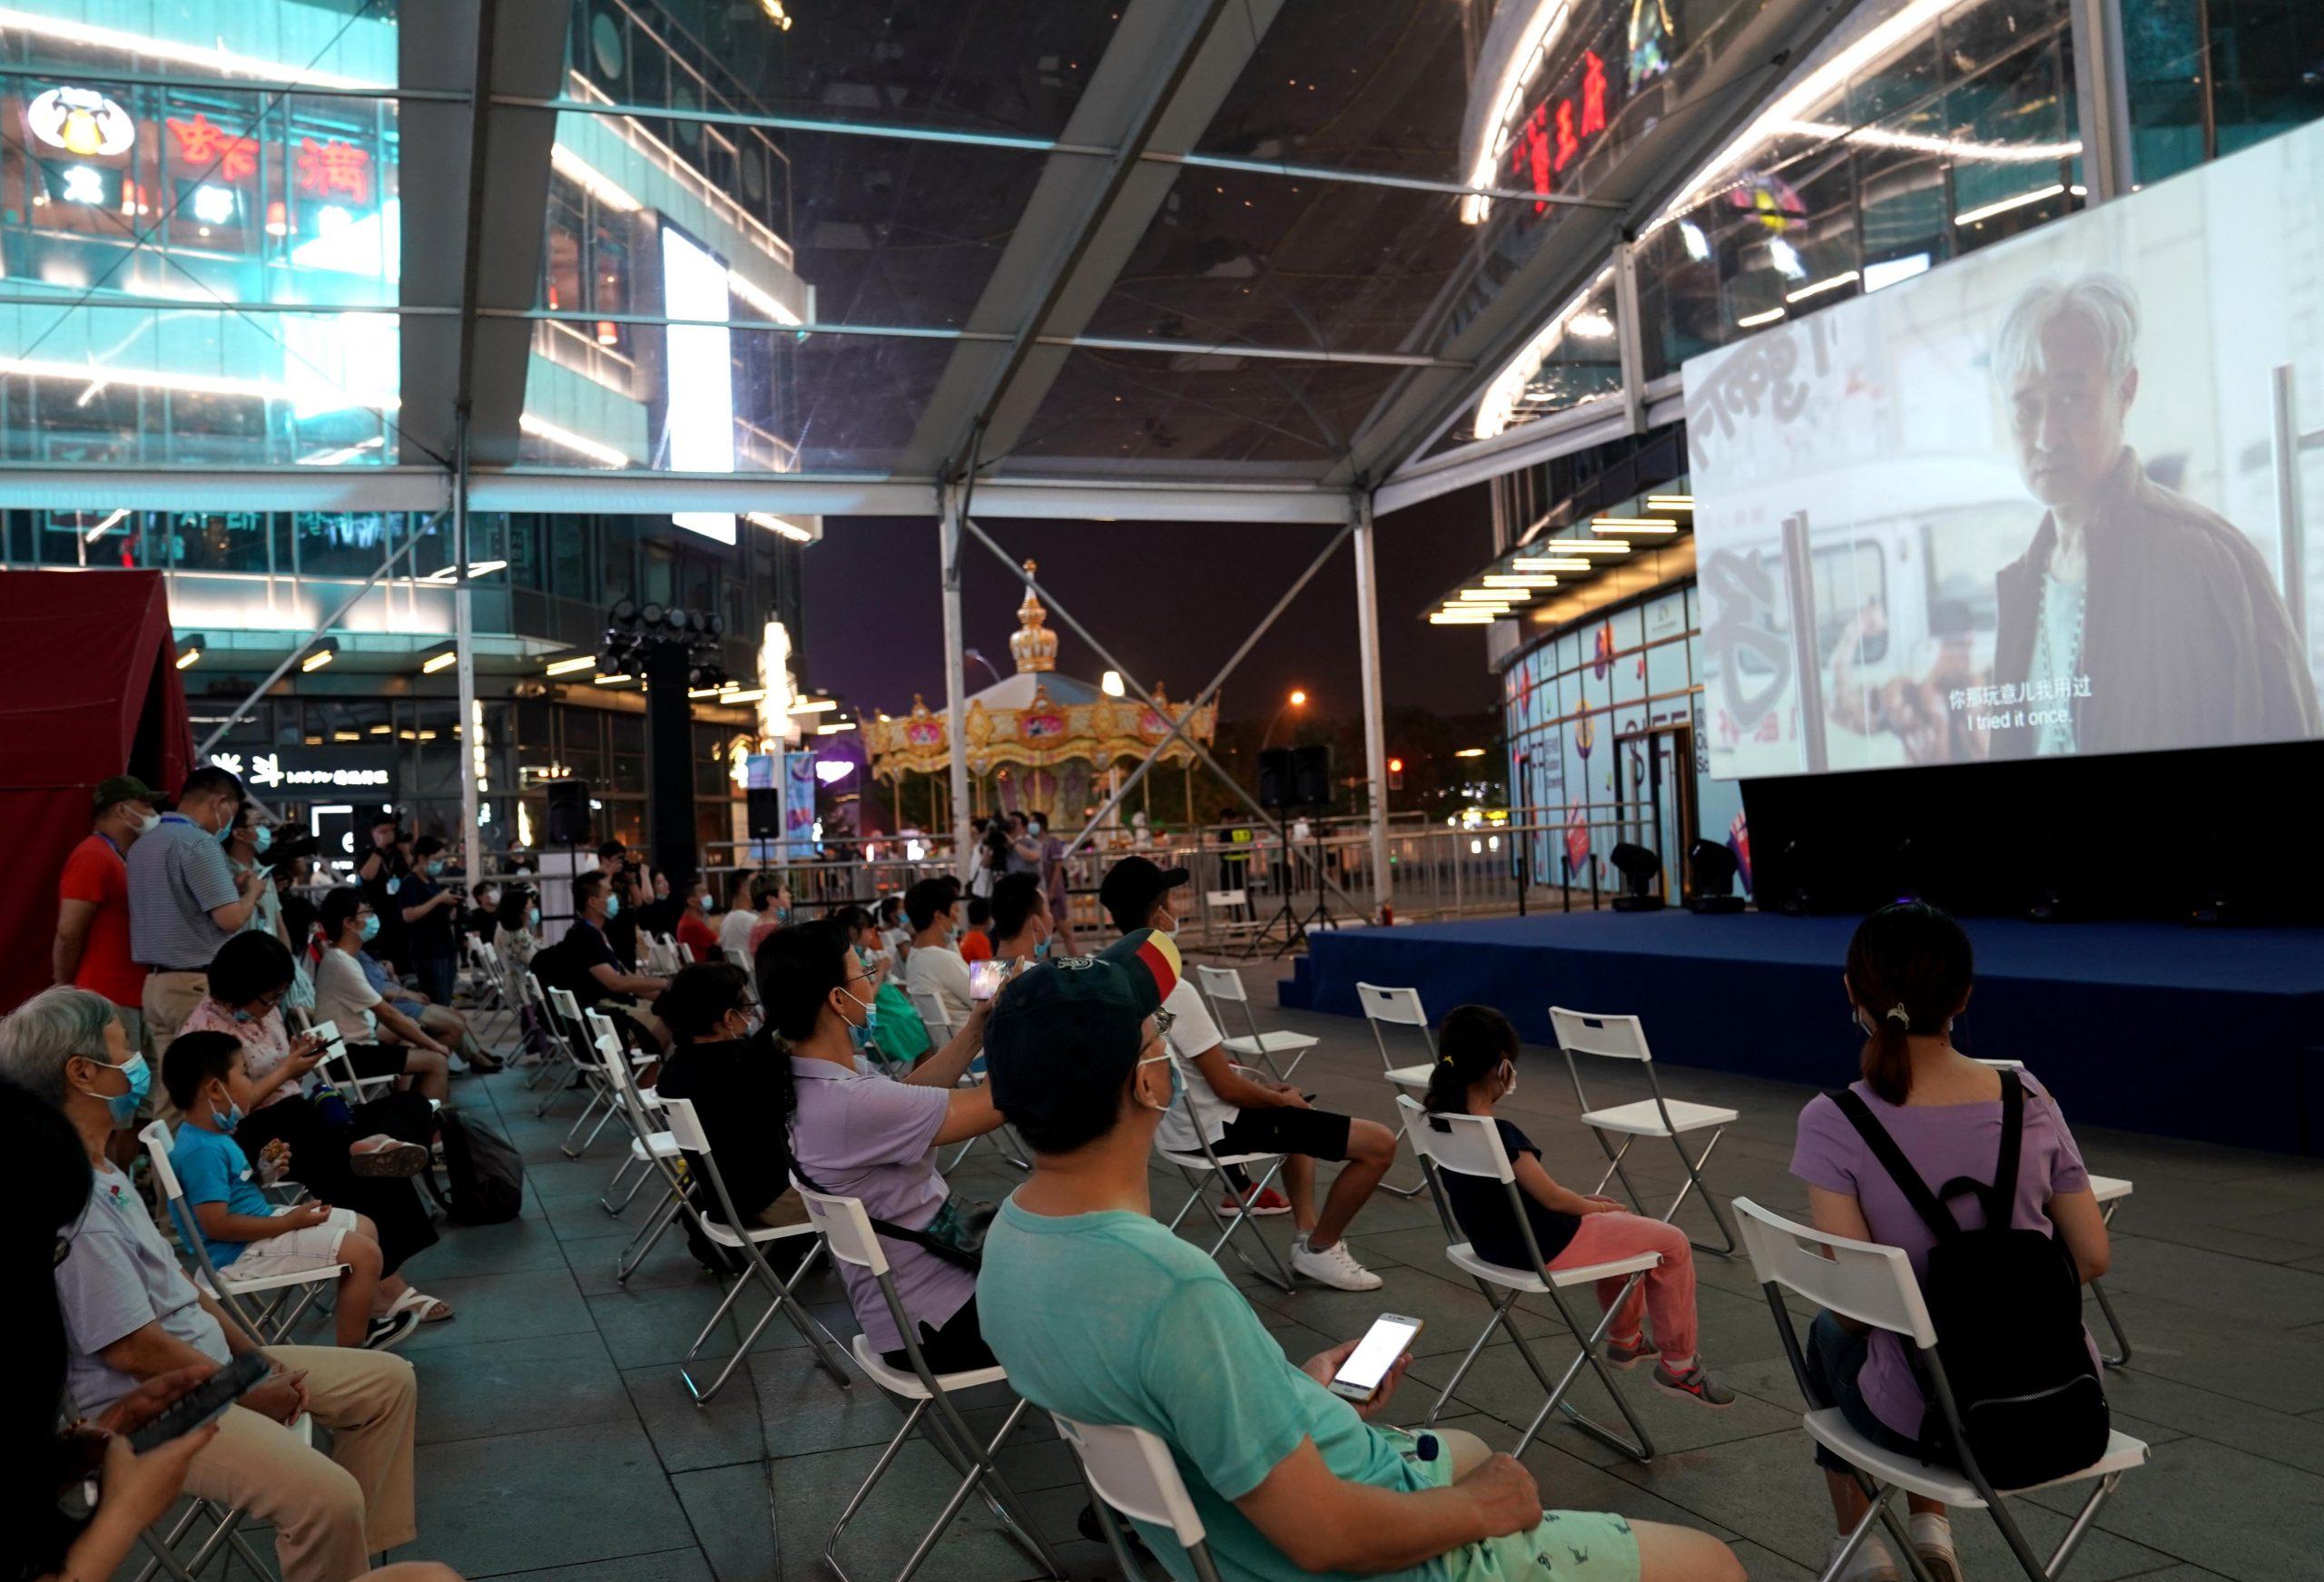 Festival de Cine de Shanghai inaugura mercado en línea